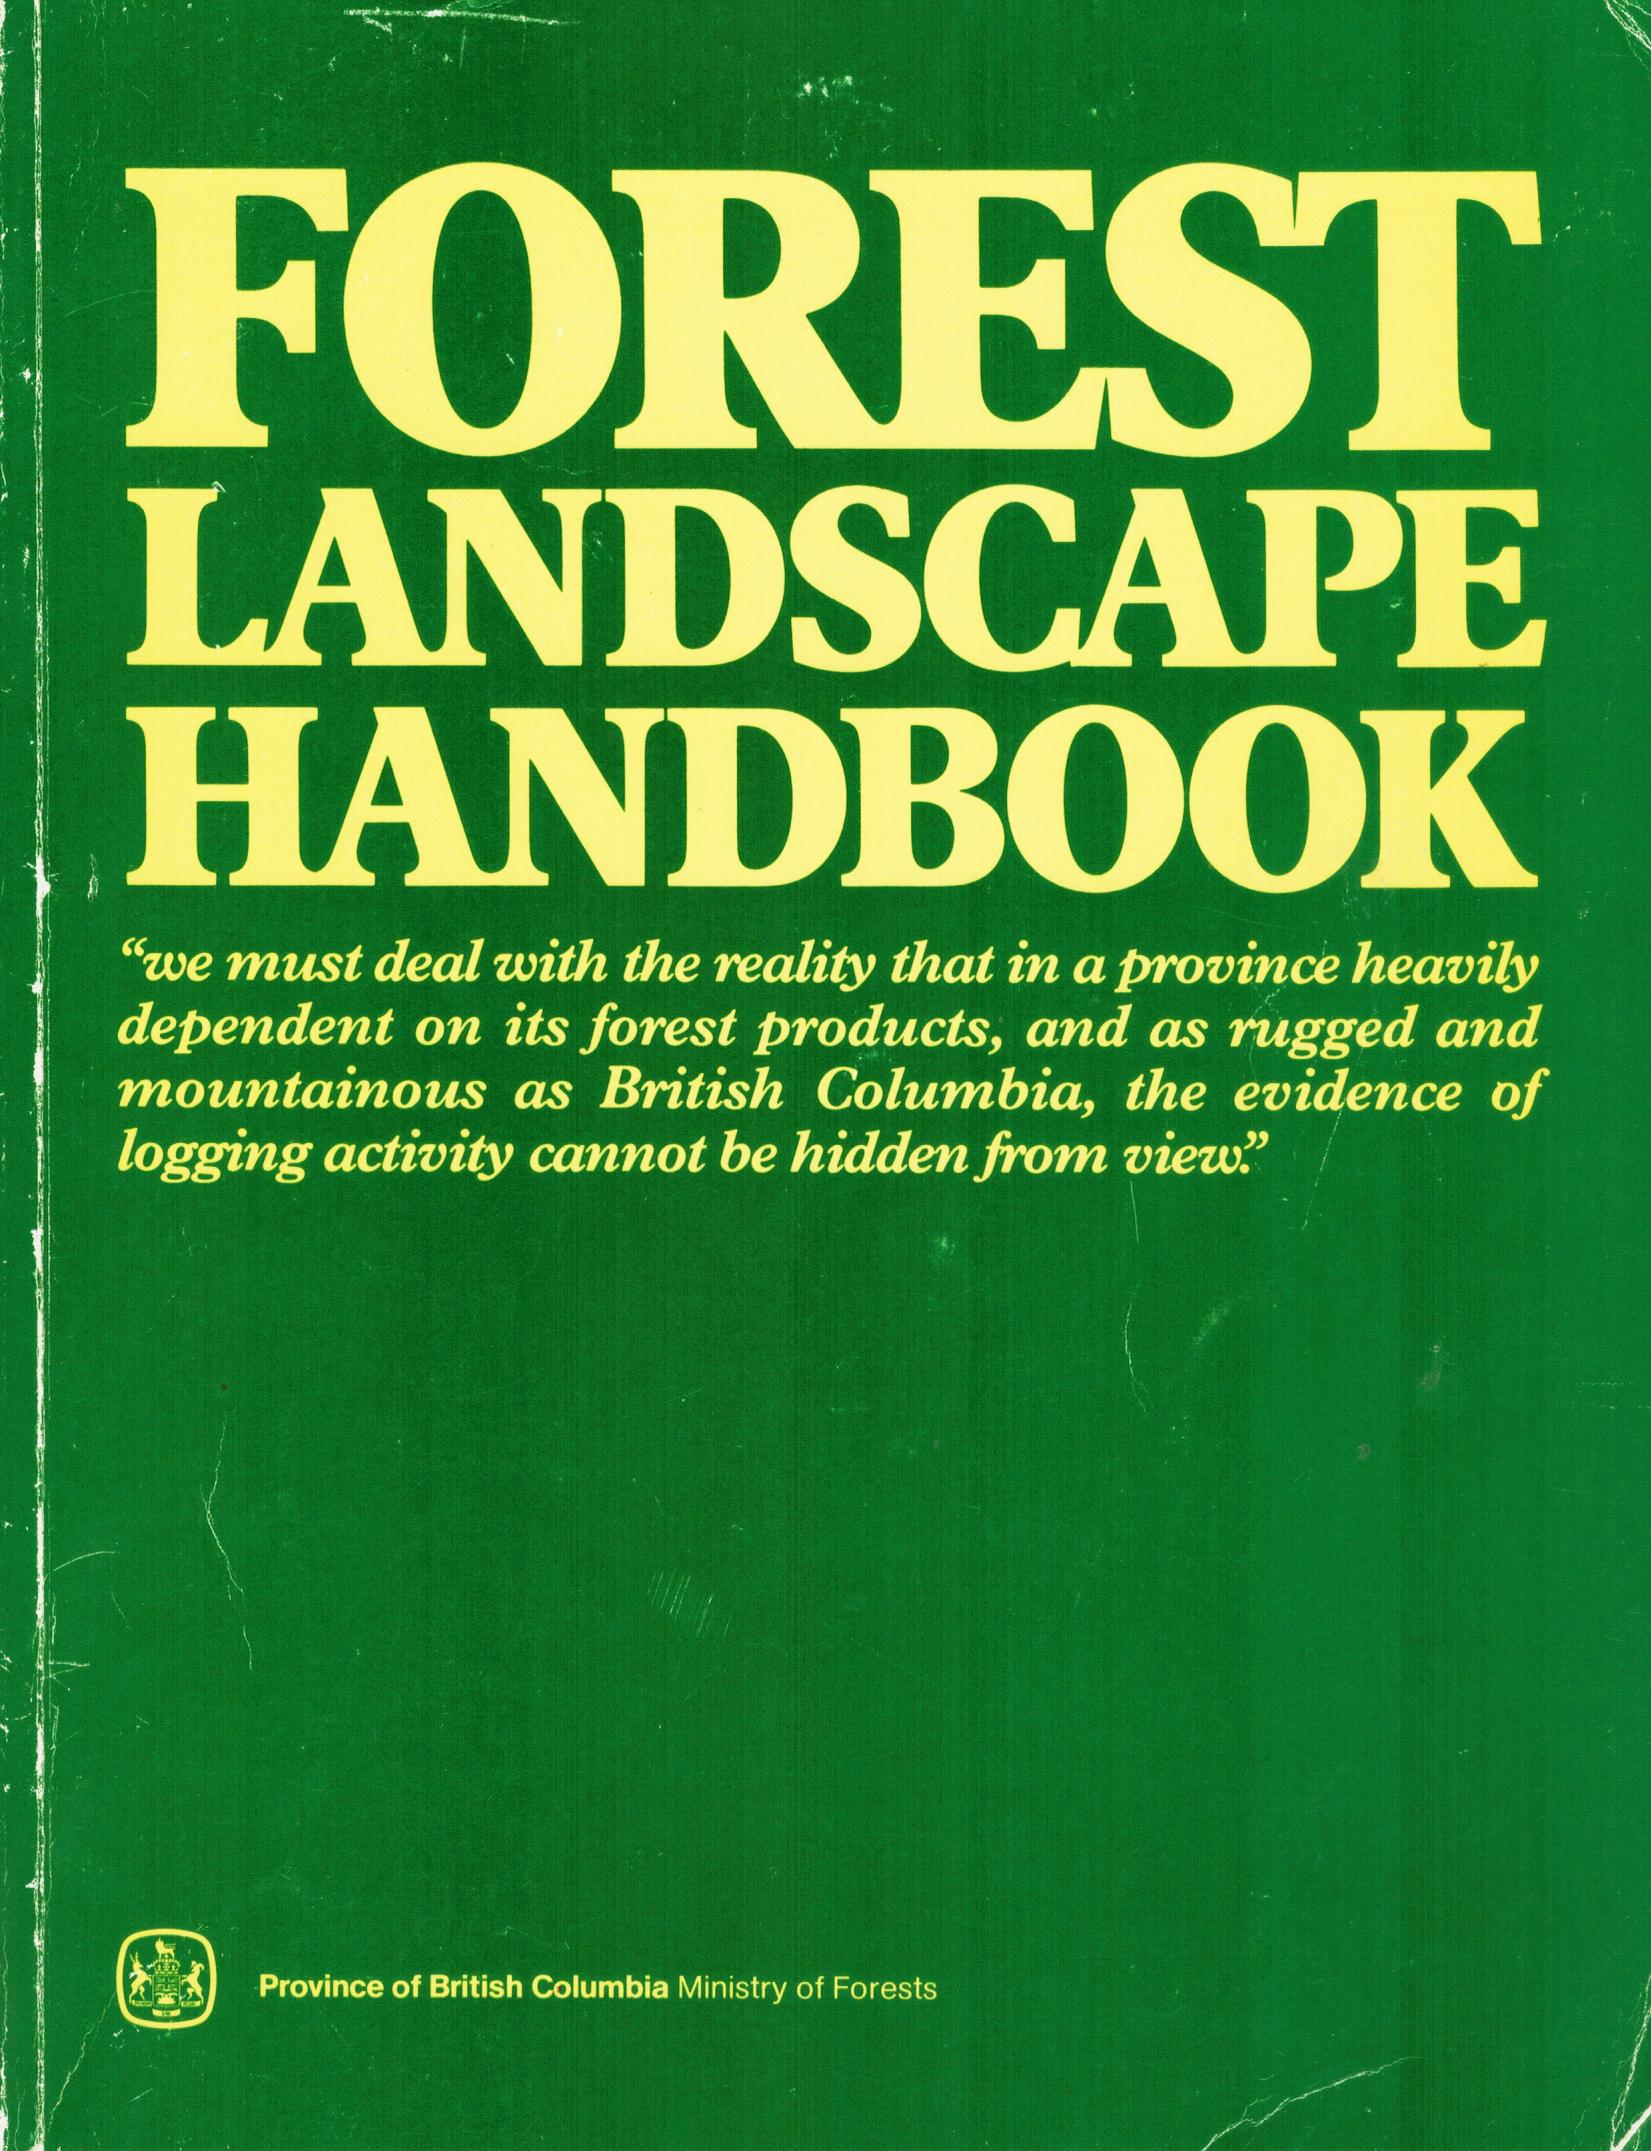 Original Forest Landscape Handbook Cover 1981